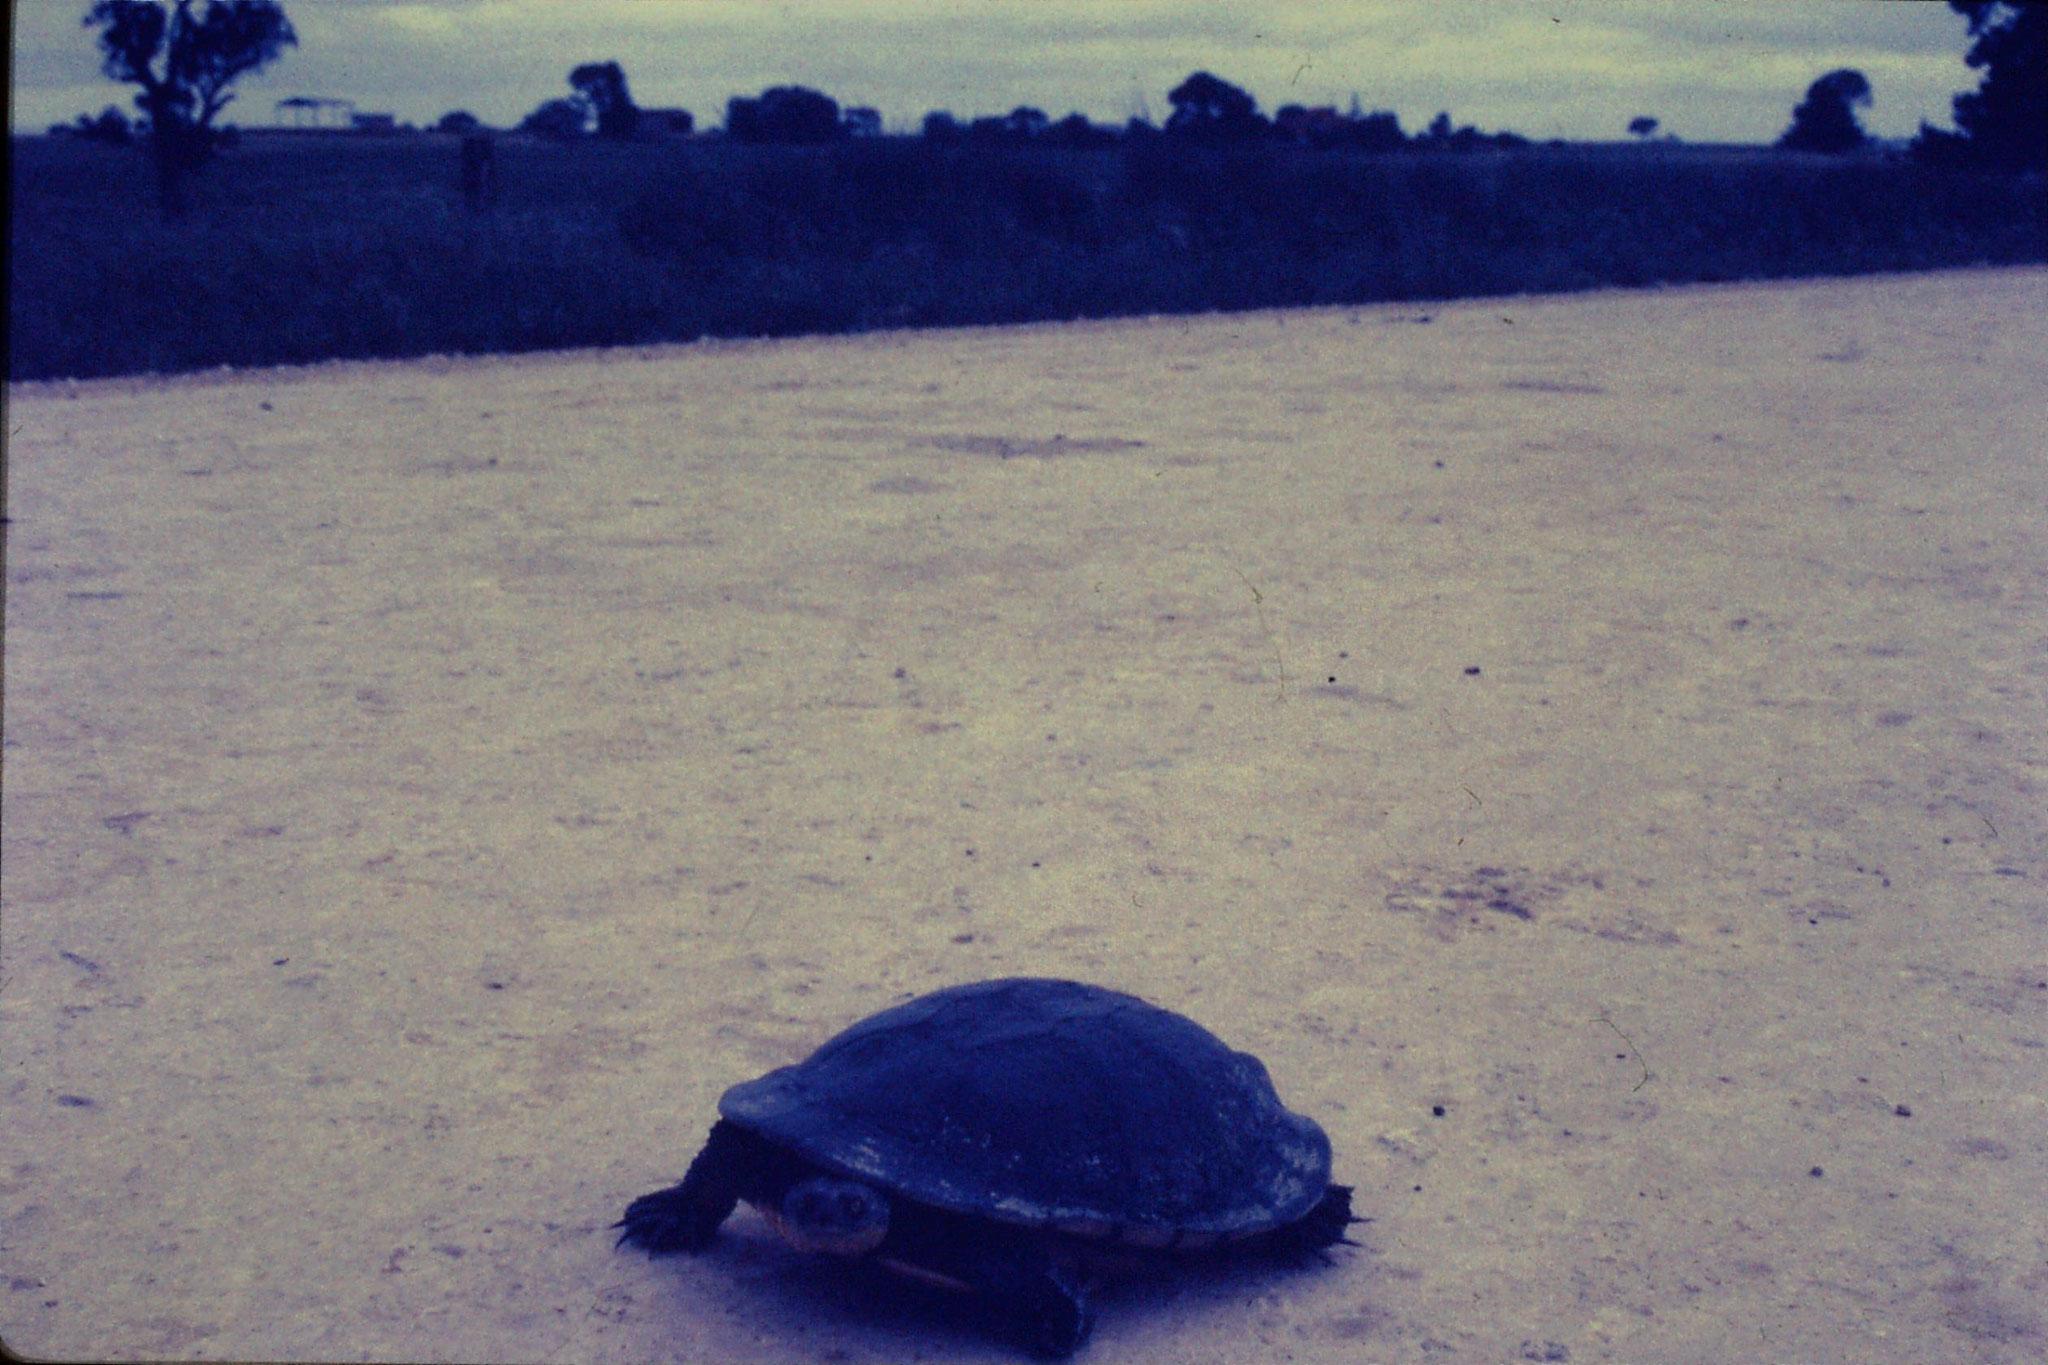 7/11/1990: 5: Naracoorte, tortoise 9 inch